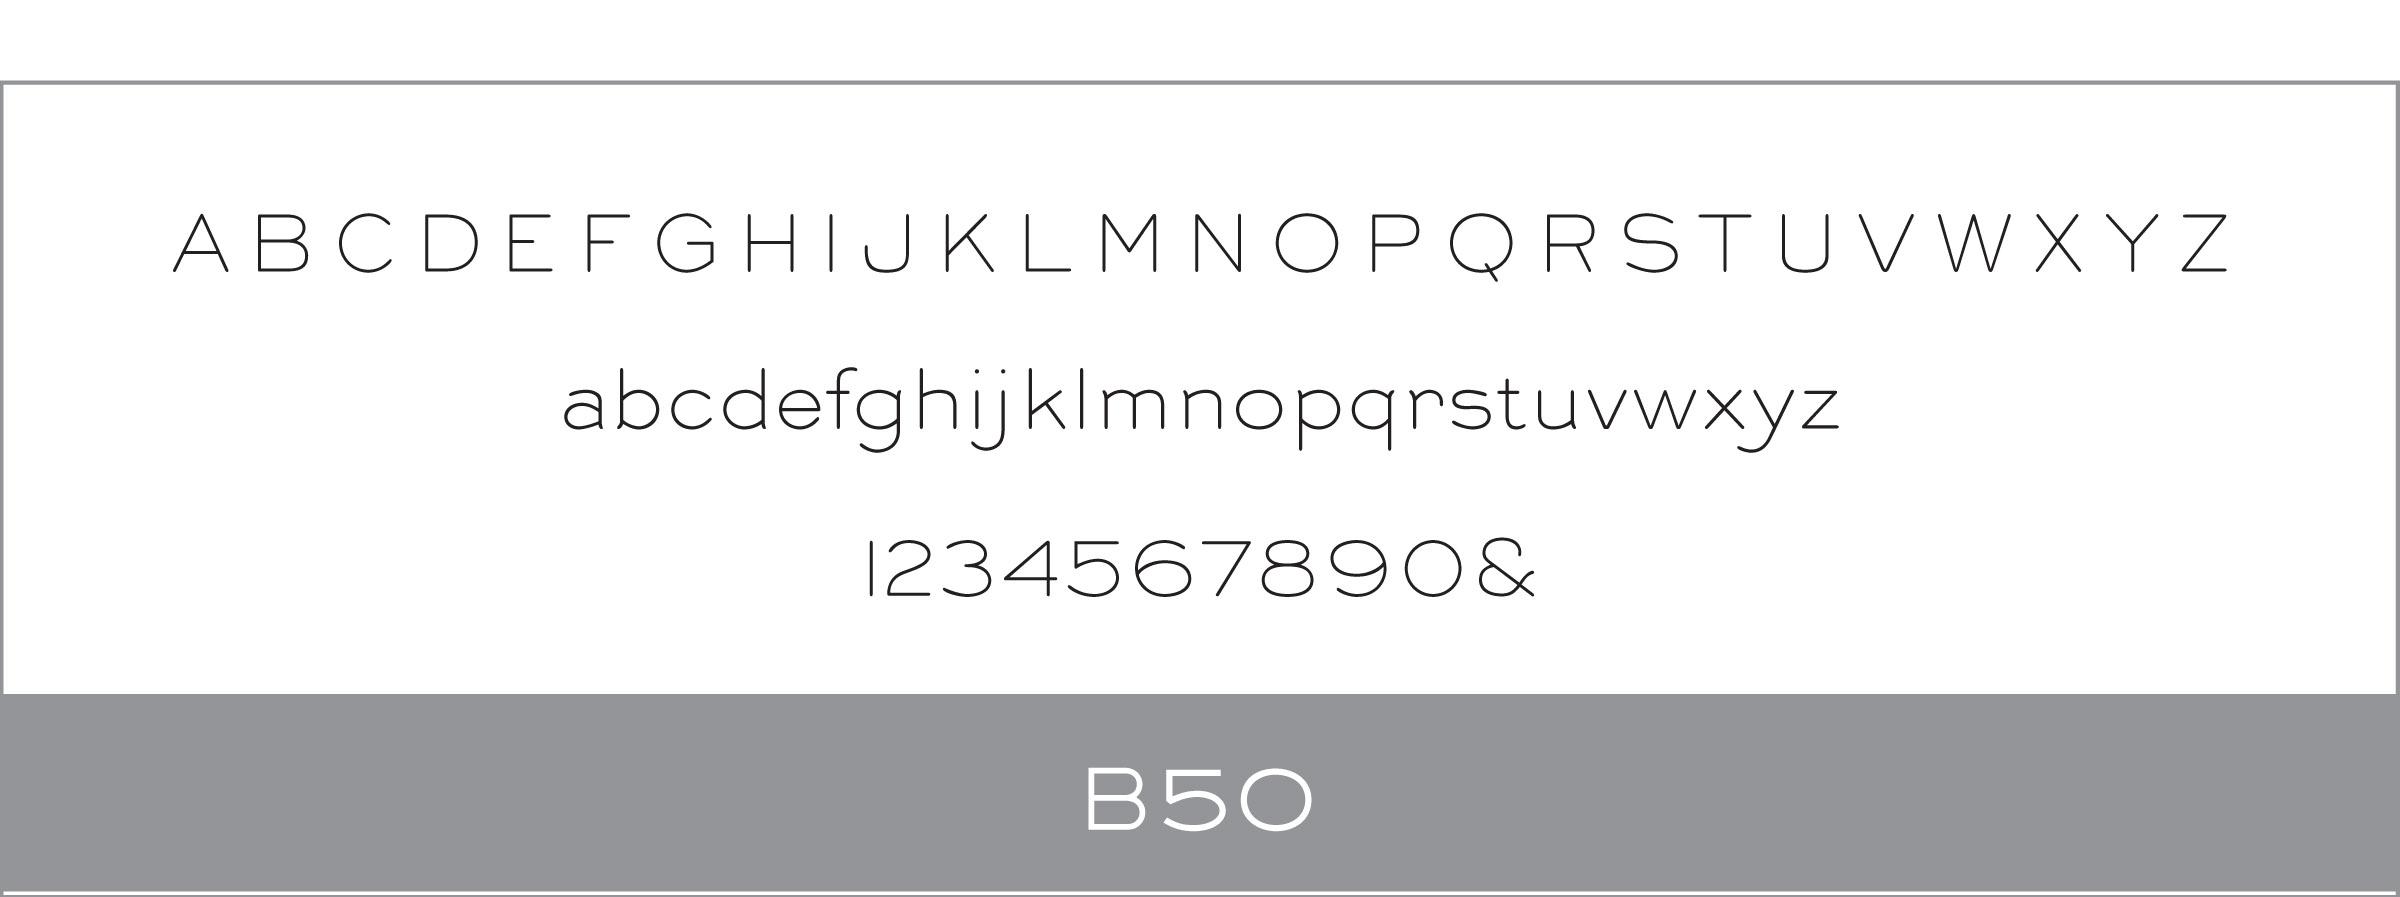 B50_Haute_Papier_Font.jpg